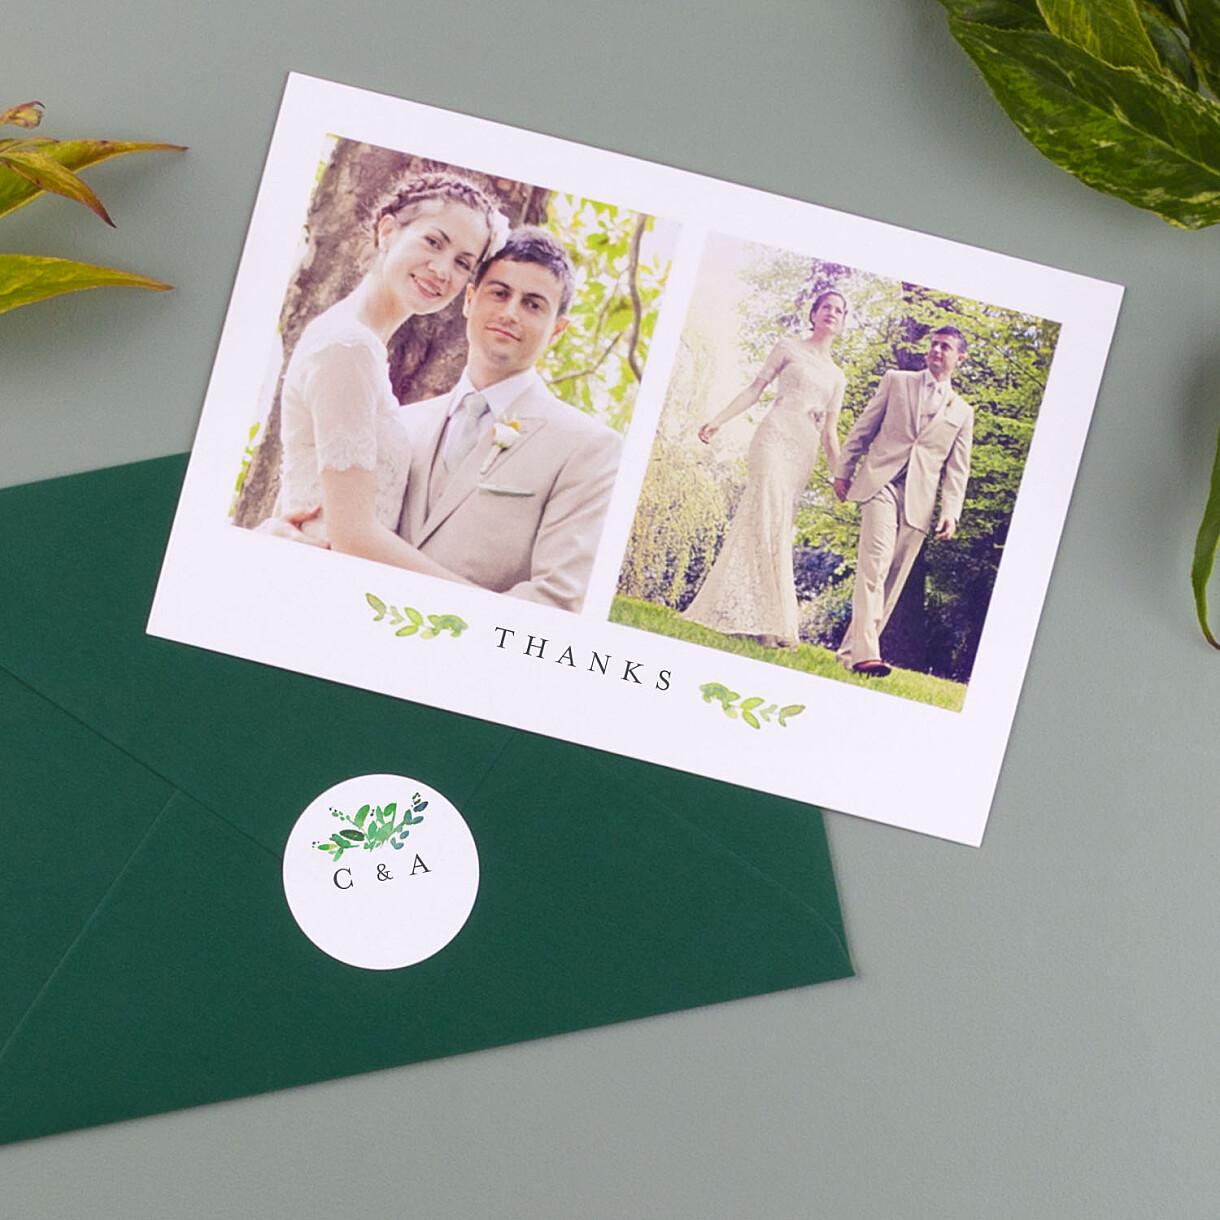 Canopy wedding envelope stickers